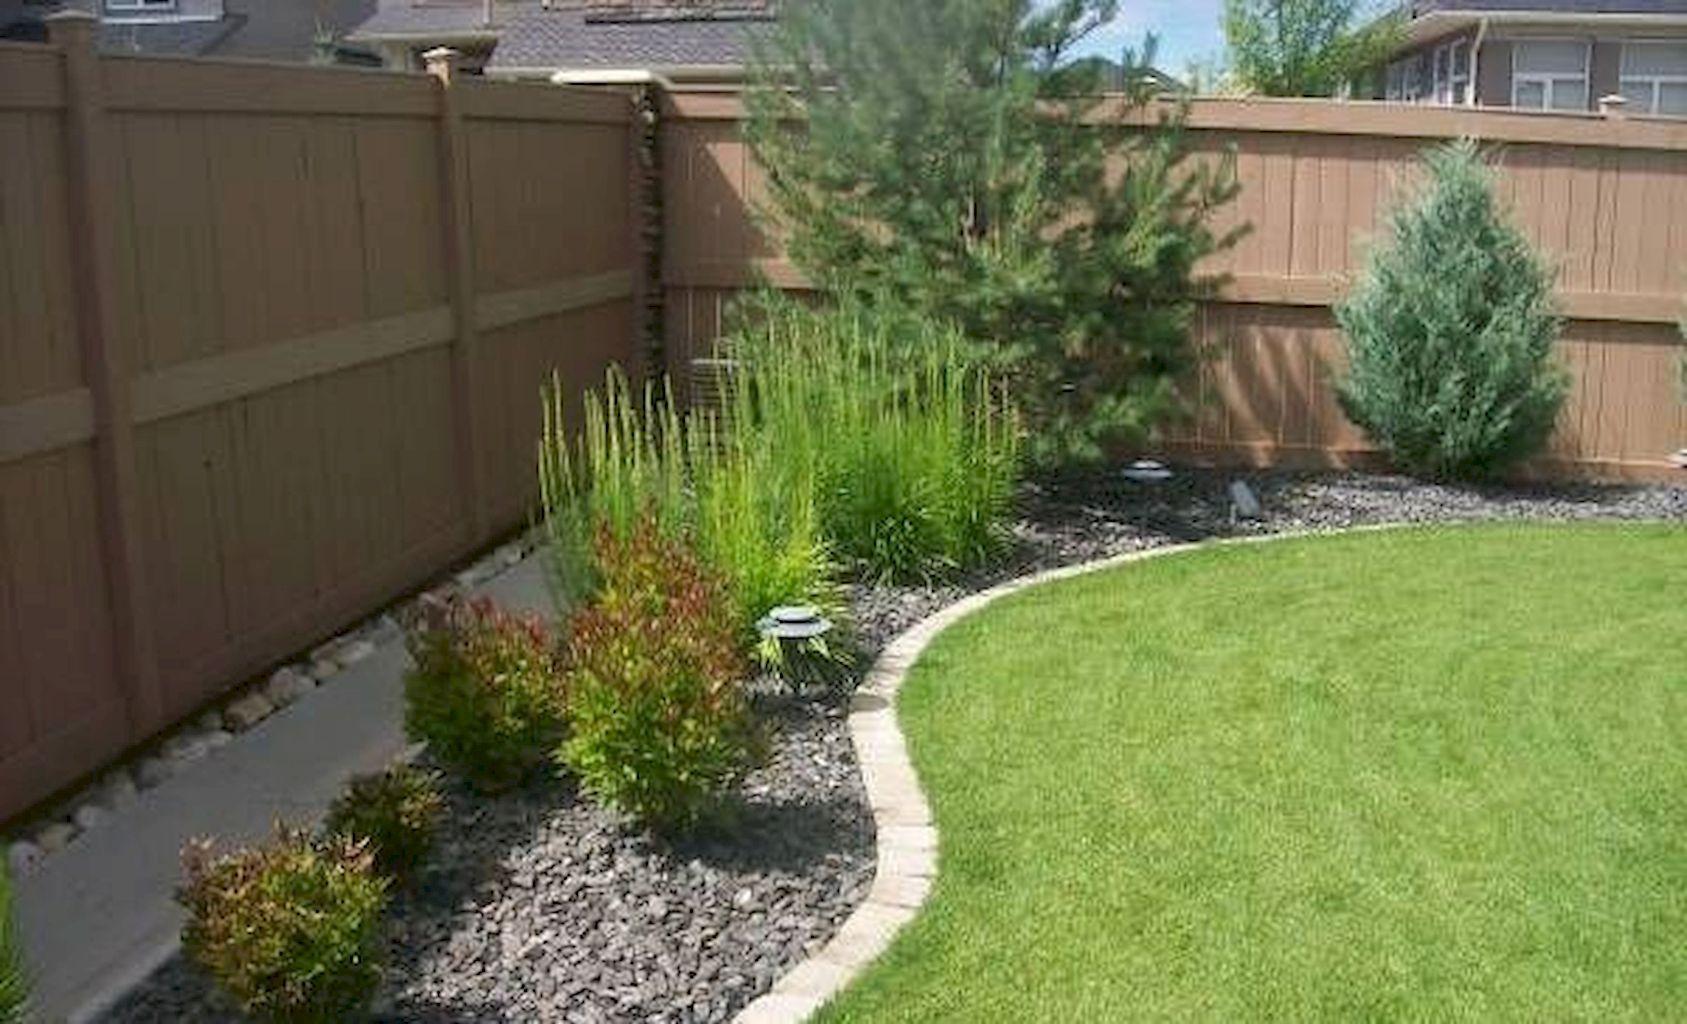 Backyard Landscaping Ideas To Spruce Up Your Home Appeal Male Zahrady Predzahradka Obrubniky